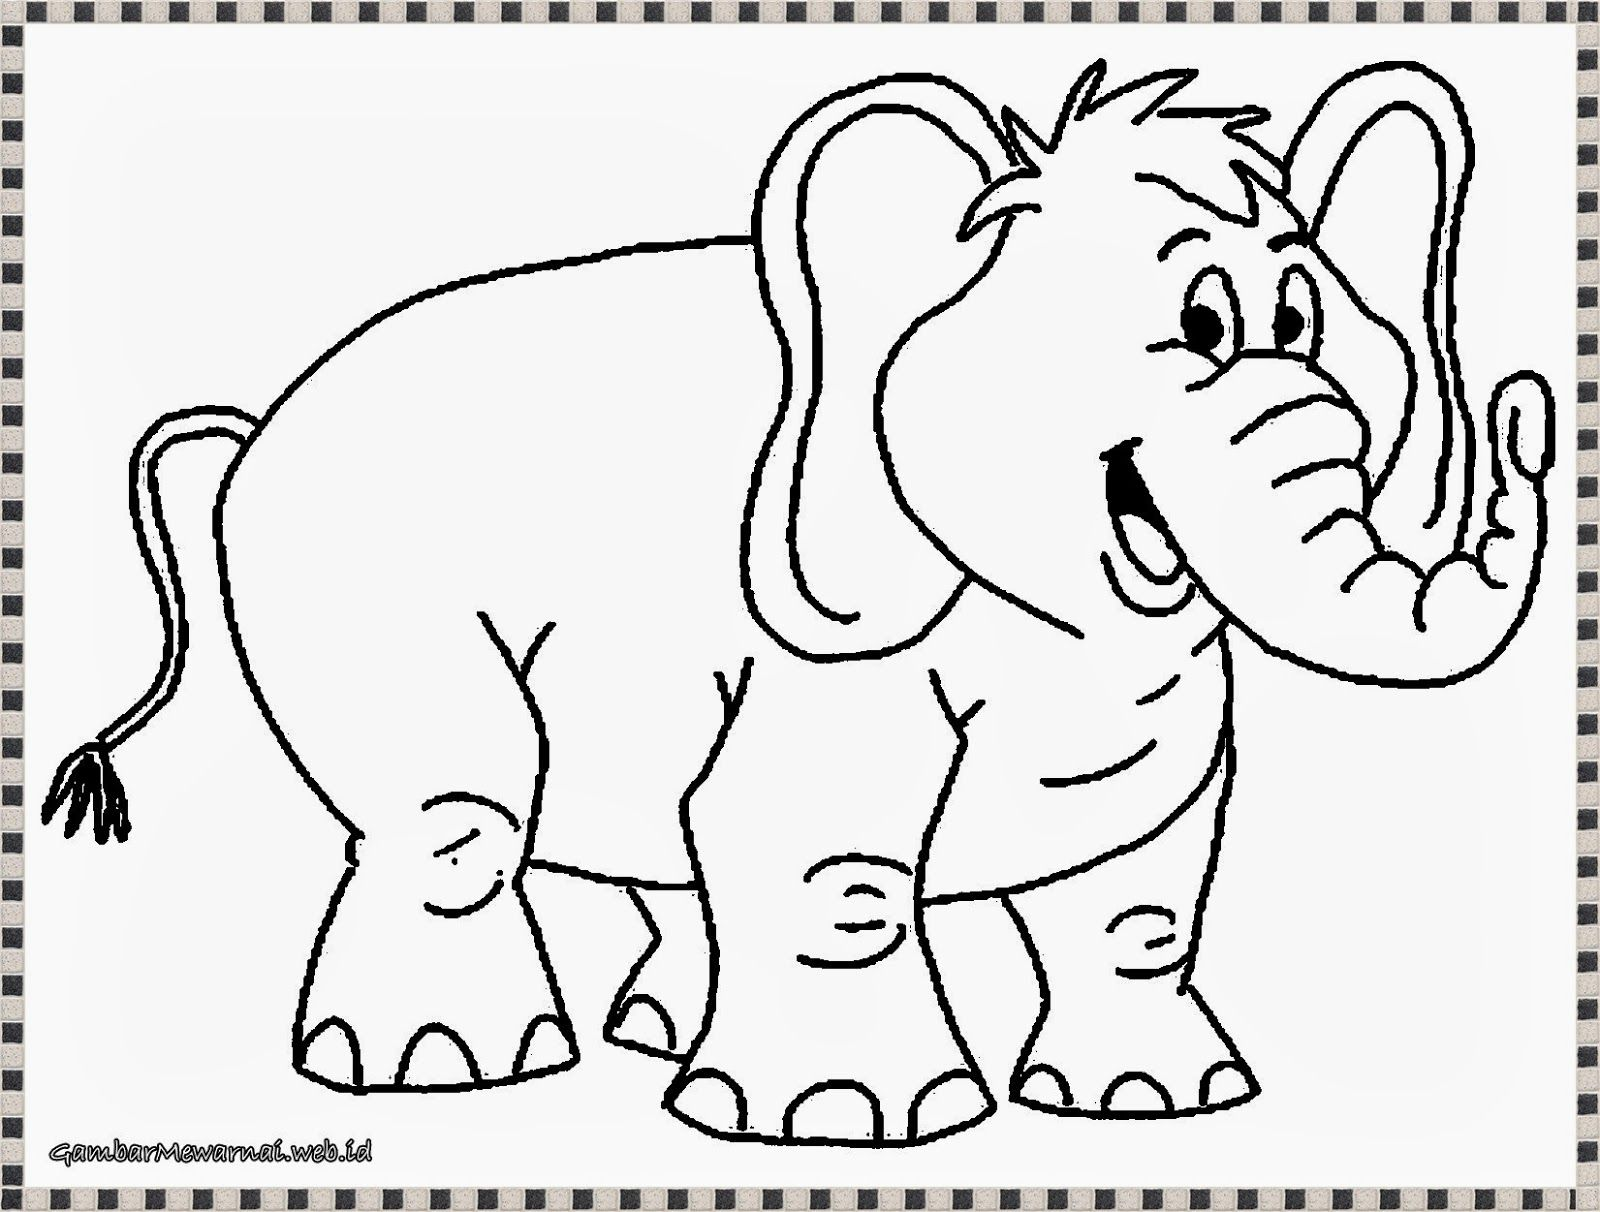 Gambar Mewarnai Gajah Halaman Mewarnai, Gambar Hewan, Gajah Afrika